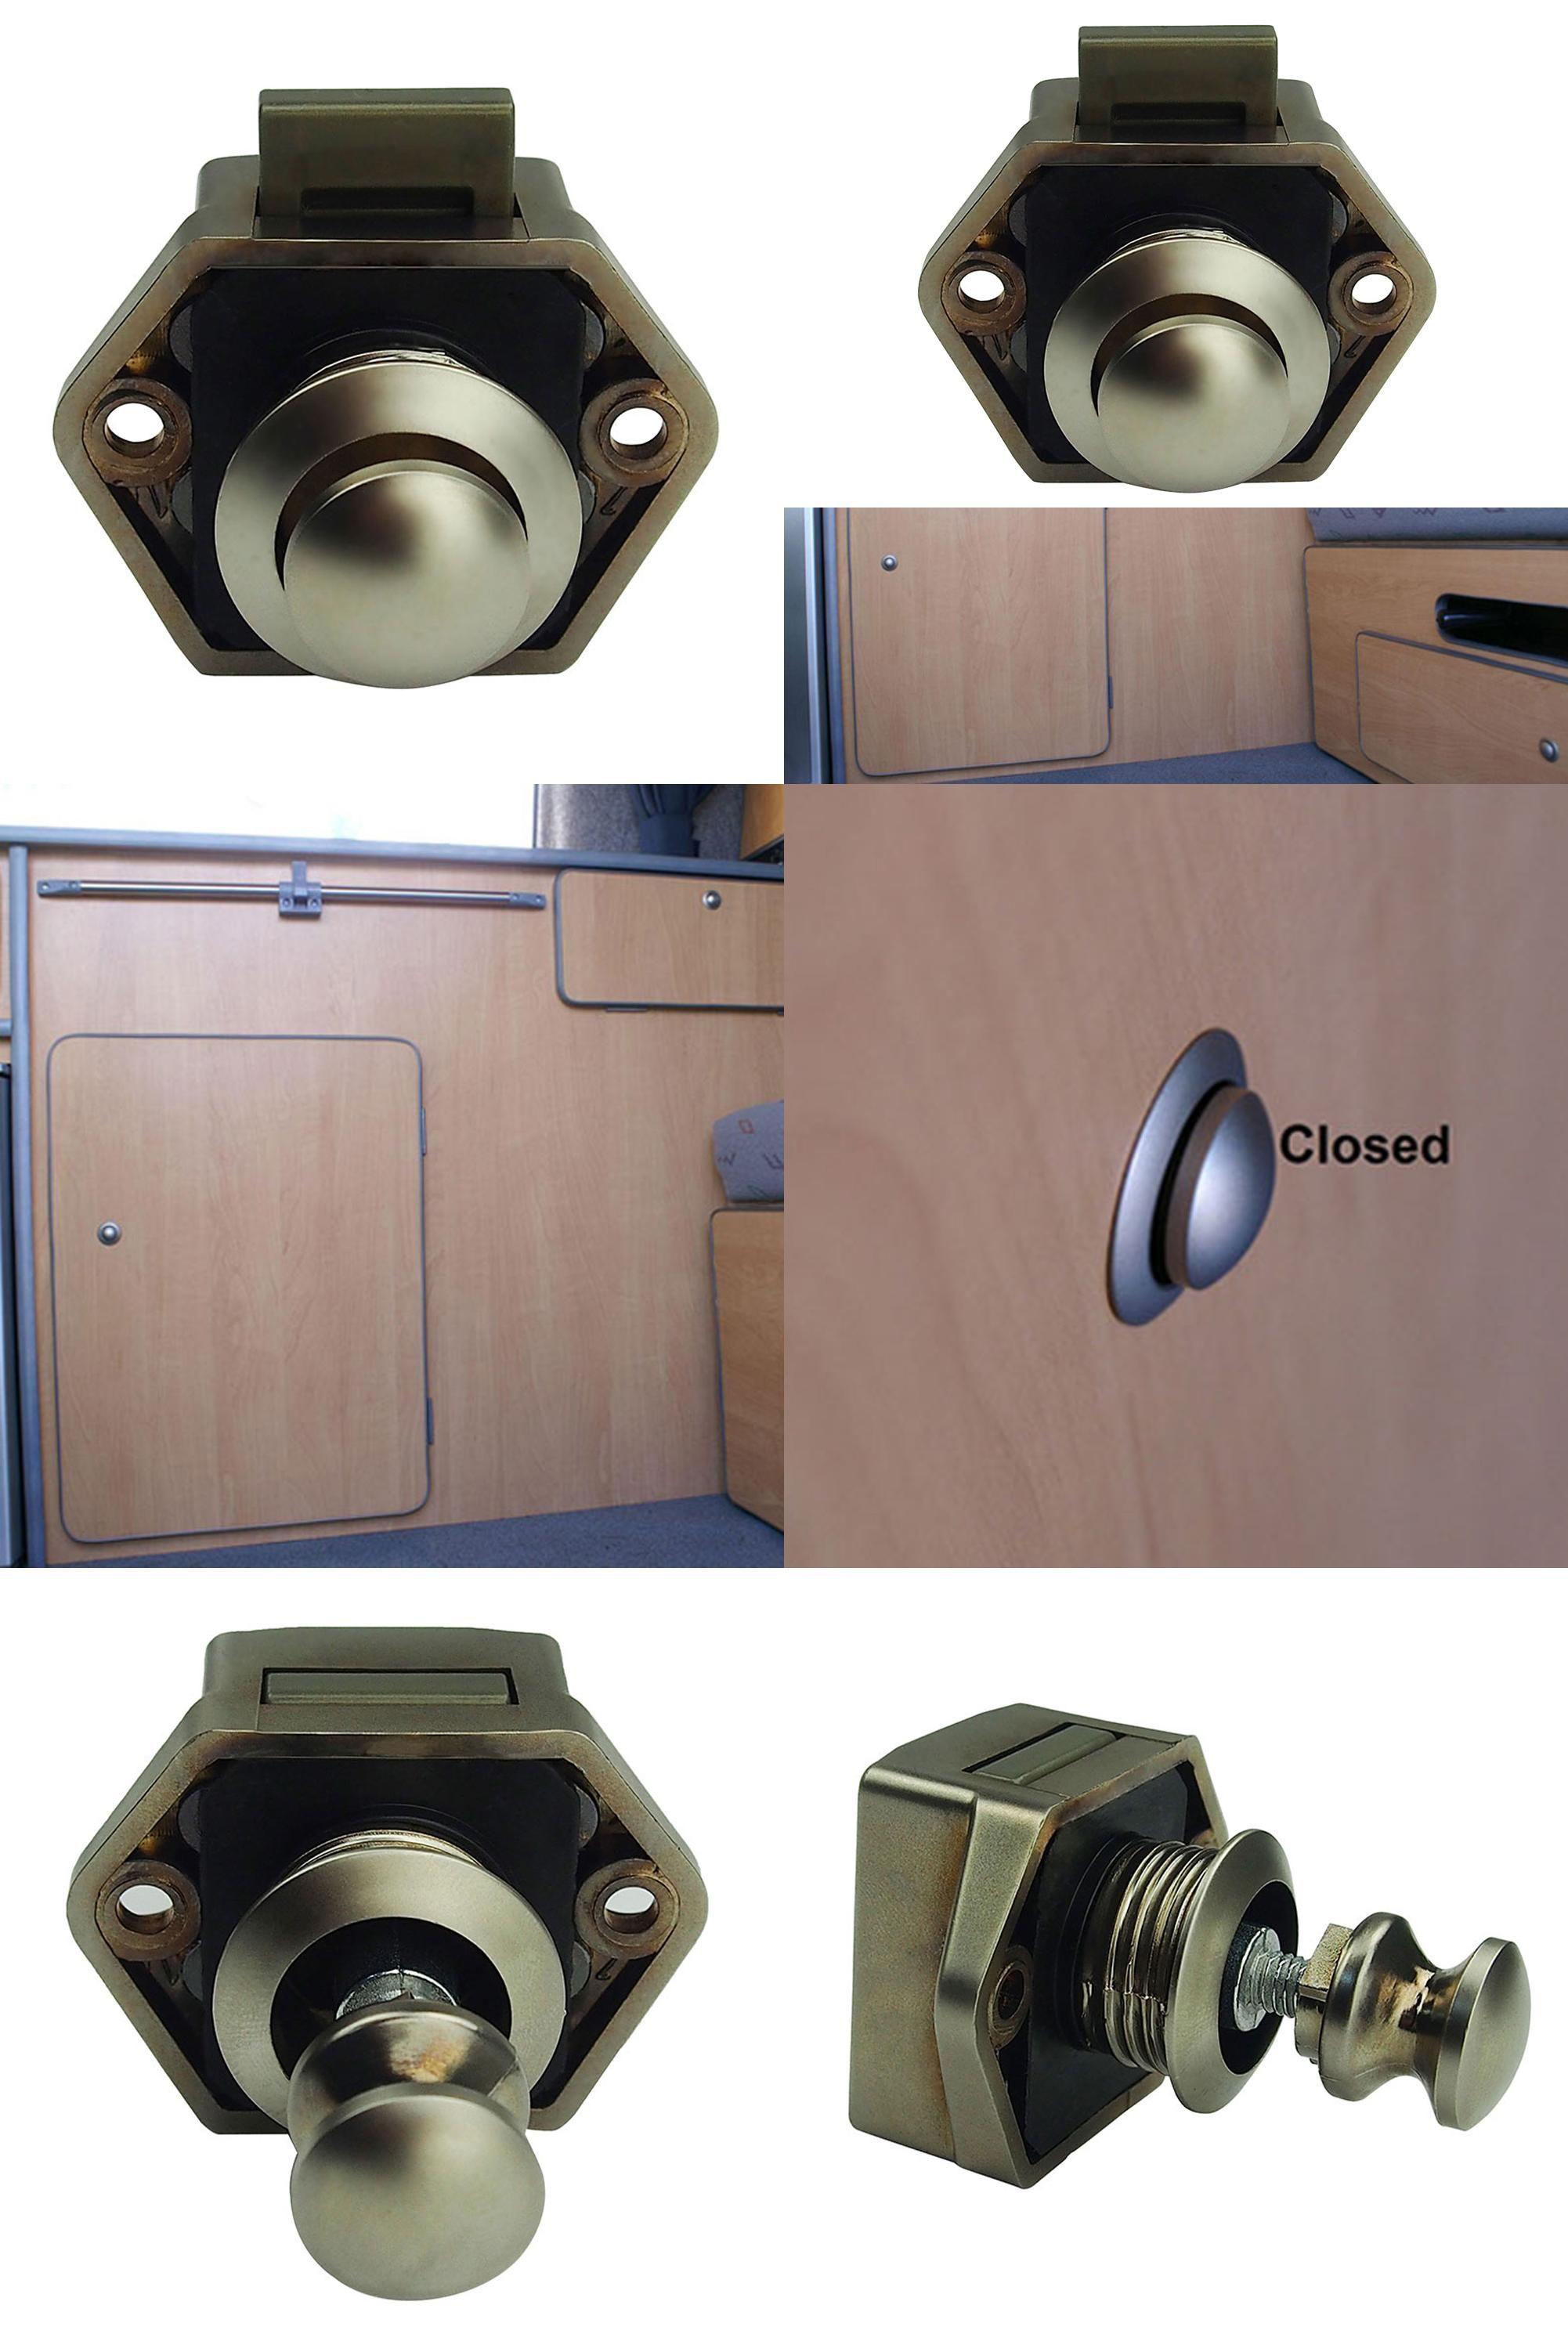 Visit to Buy] Push Lock Button 20mm Cupboard Door Knob RV Camper Car